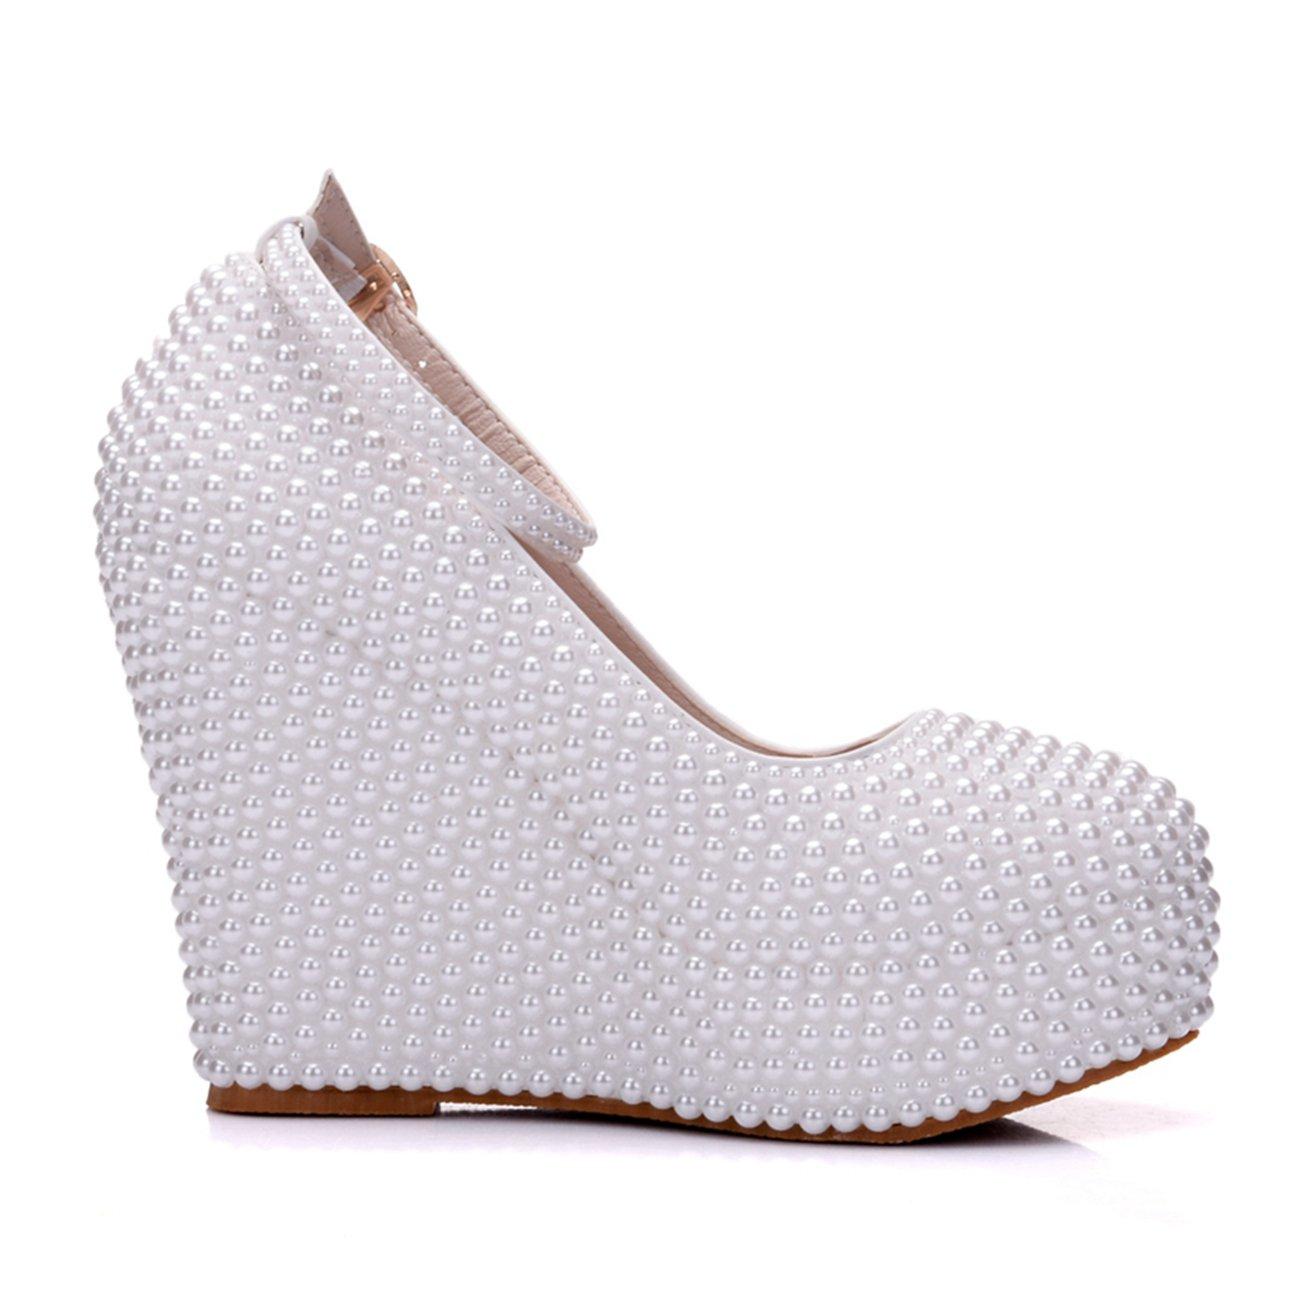 Minishion Womens Hidden High Heel Platform Pearl Beading Wedge Heel High Wedding Evening Shoes B075534J3P 8.5 B(M) US|White-10cm Heel 4f7f57